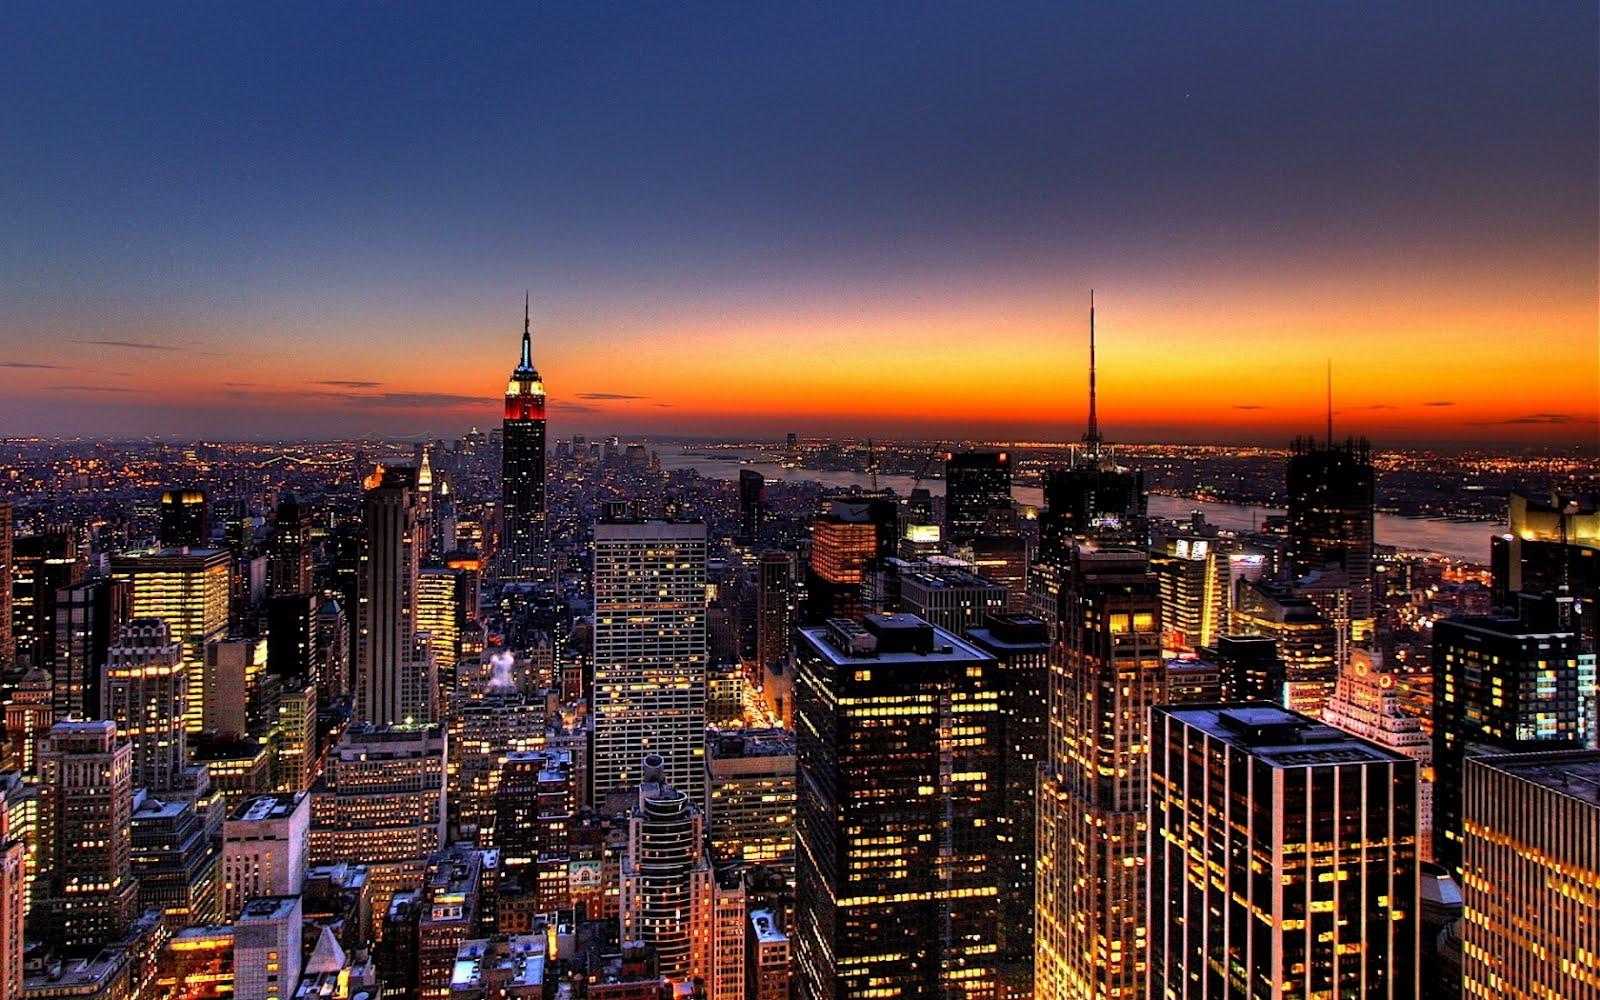 http://1.bp.blogspot.com/-lUo8fSKN3vA/T6dzVBBnYxI/AAAAAAAAATo/l-8FDWD92es/s1600/new_york_skyline-walldictionary.com.jpg